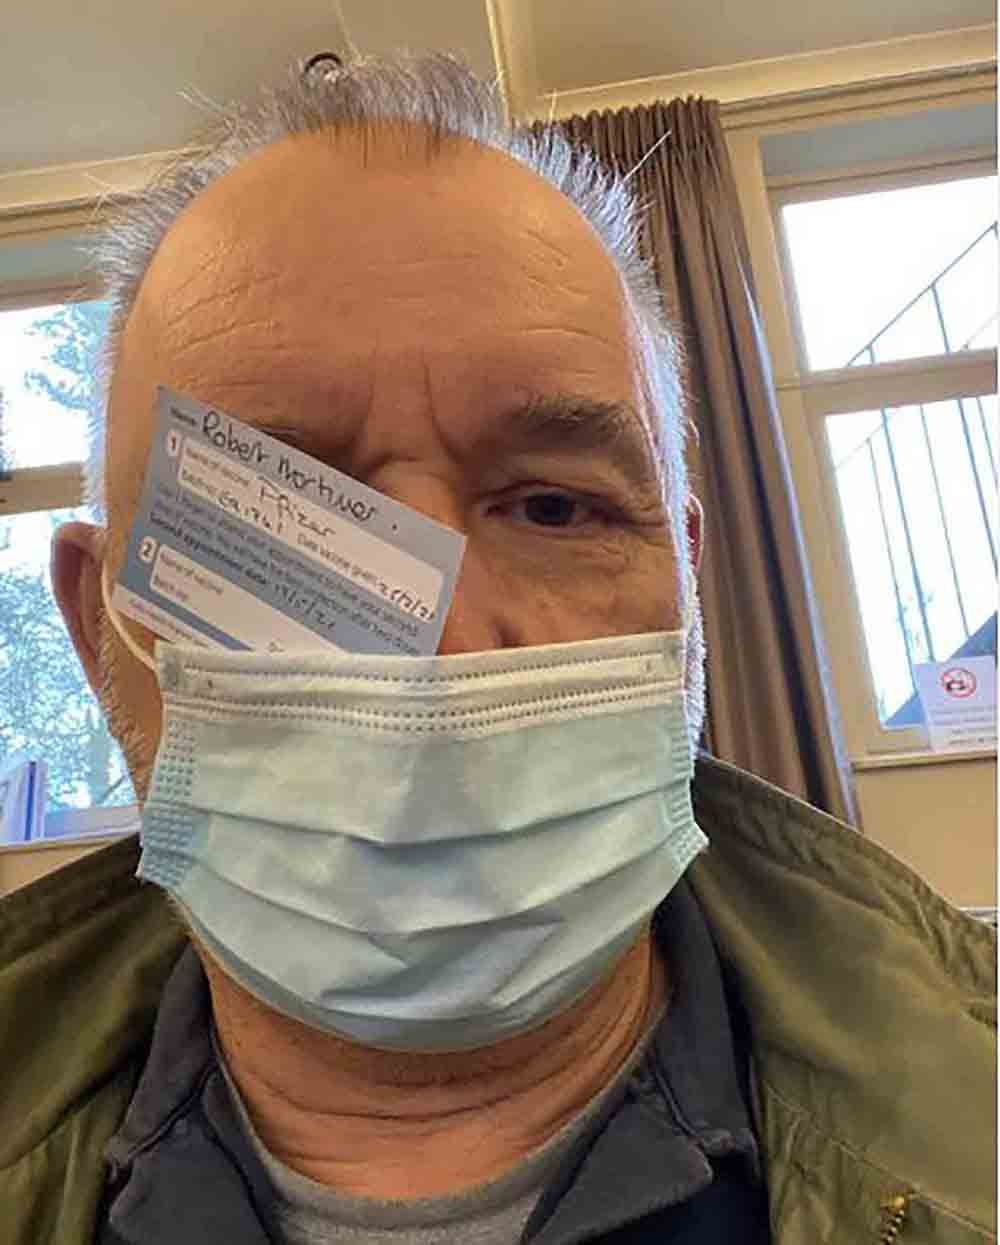 Bob Mortimer receives Covid vaccine and makes conspiracy joke - Health News